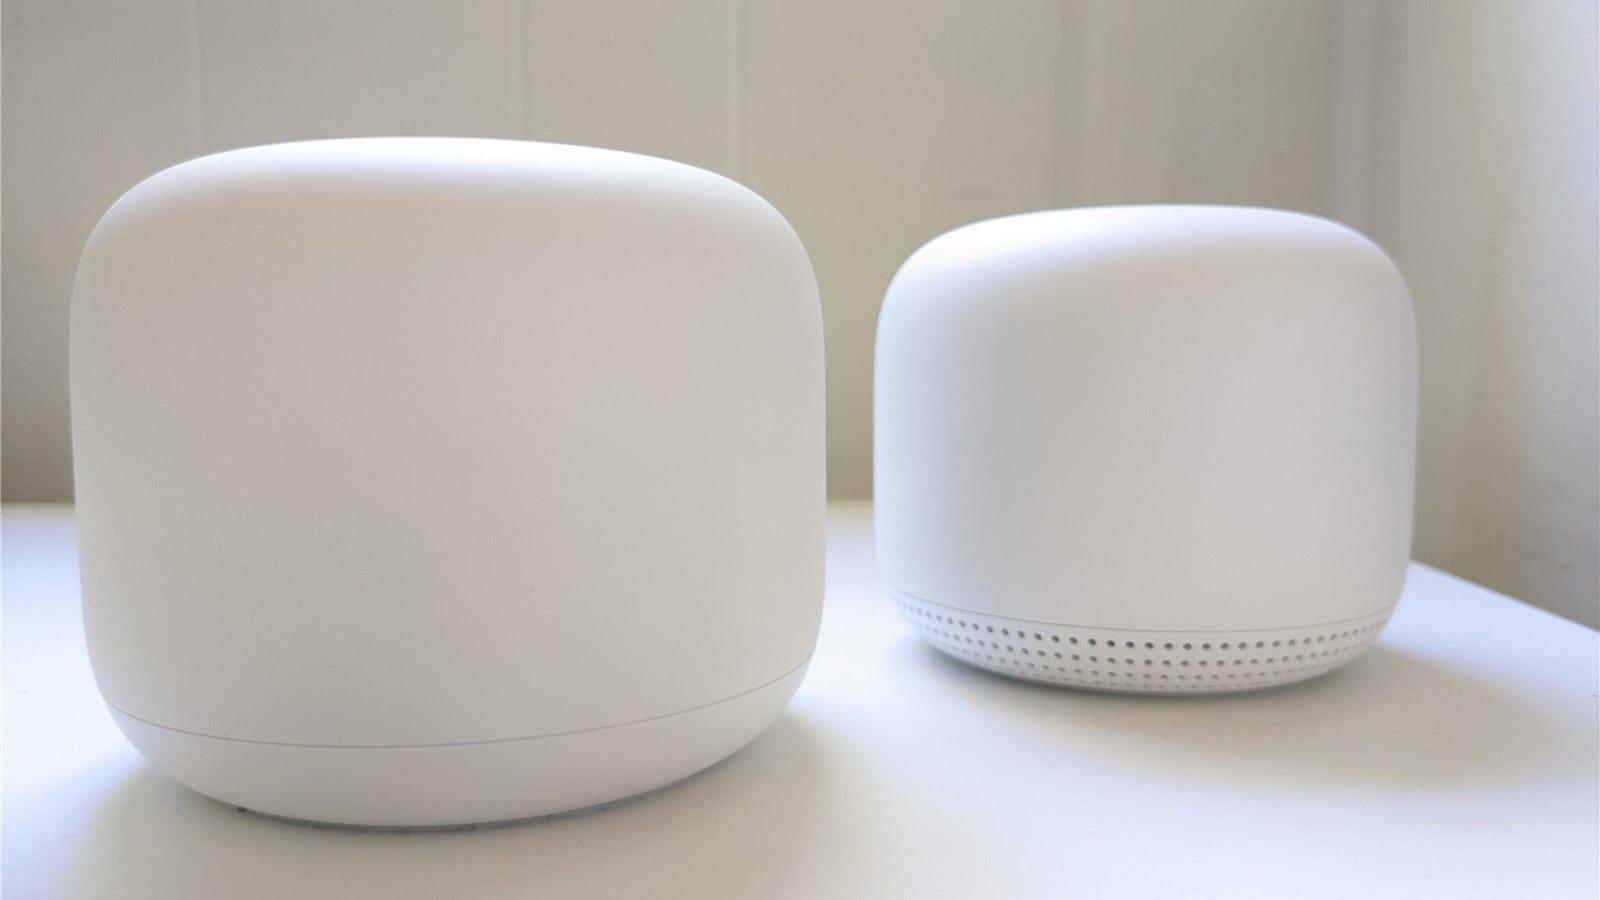 Google Nest Wifi and Satellite